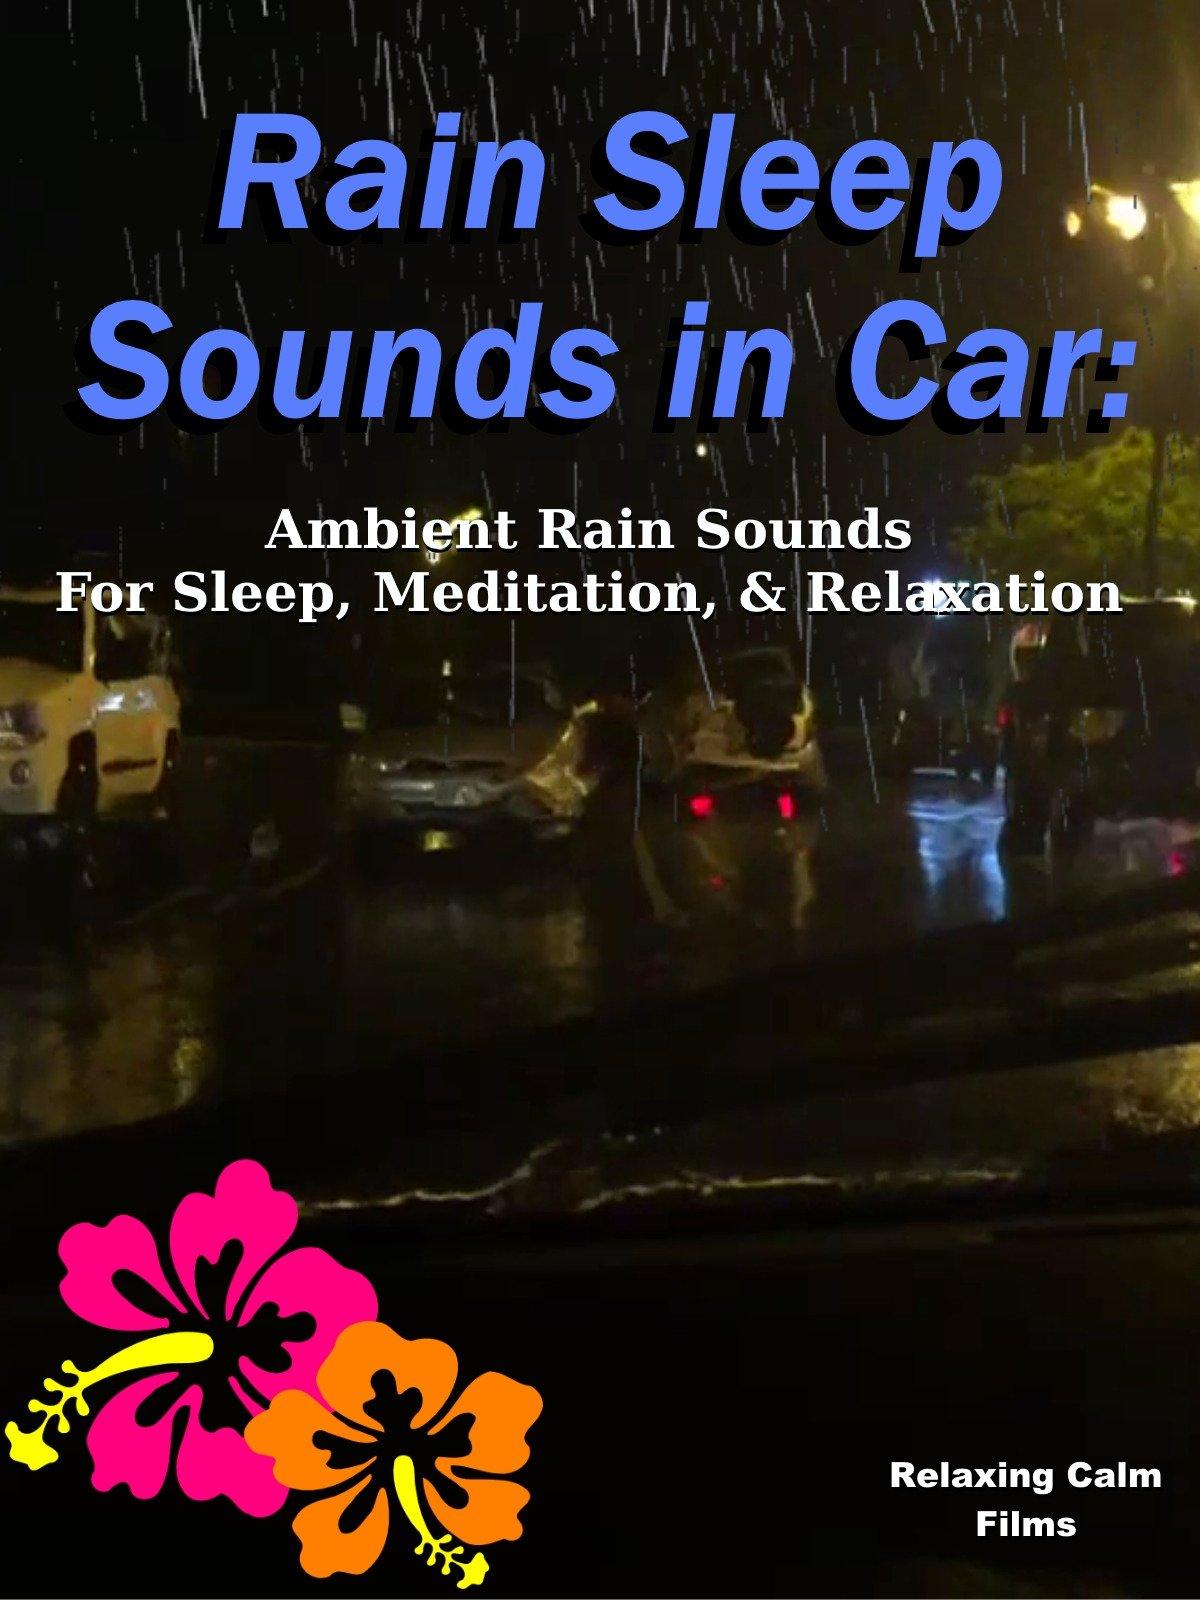 Rain Sleep Sounds in Car: Ambient Rain Sounds for Sleep, Meditation, & Relaxation